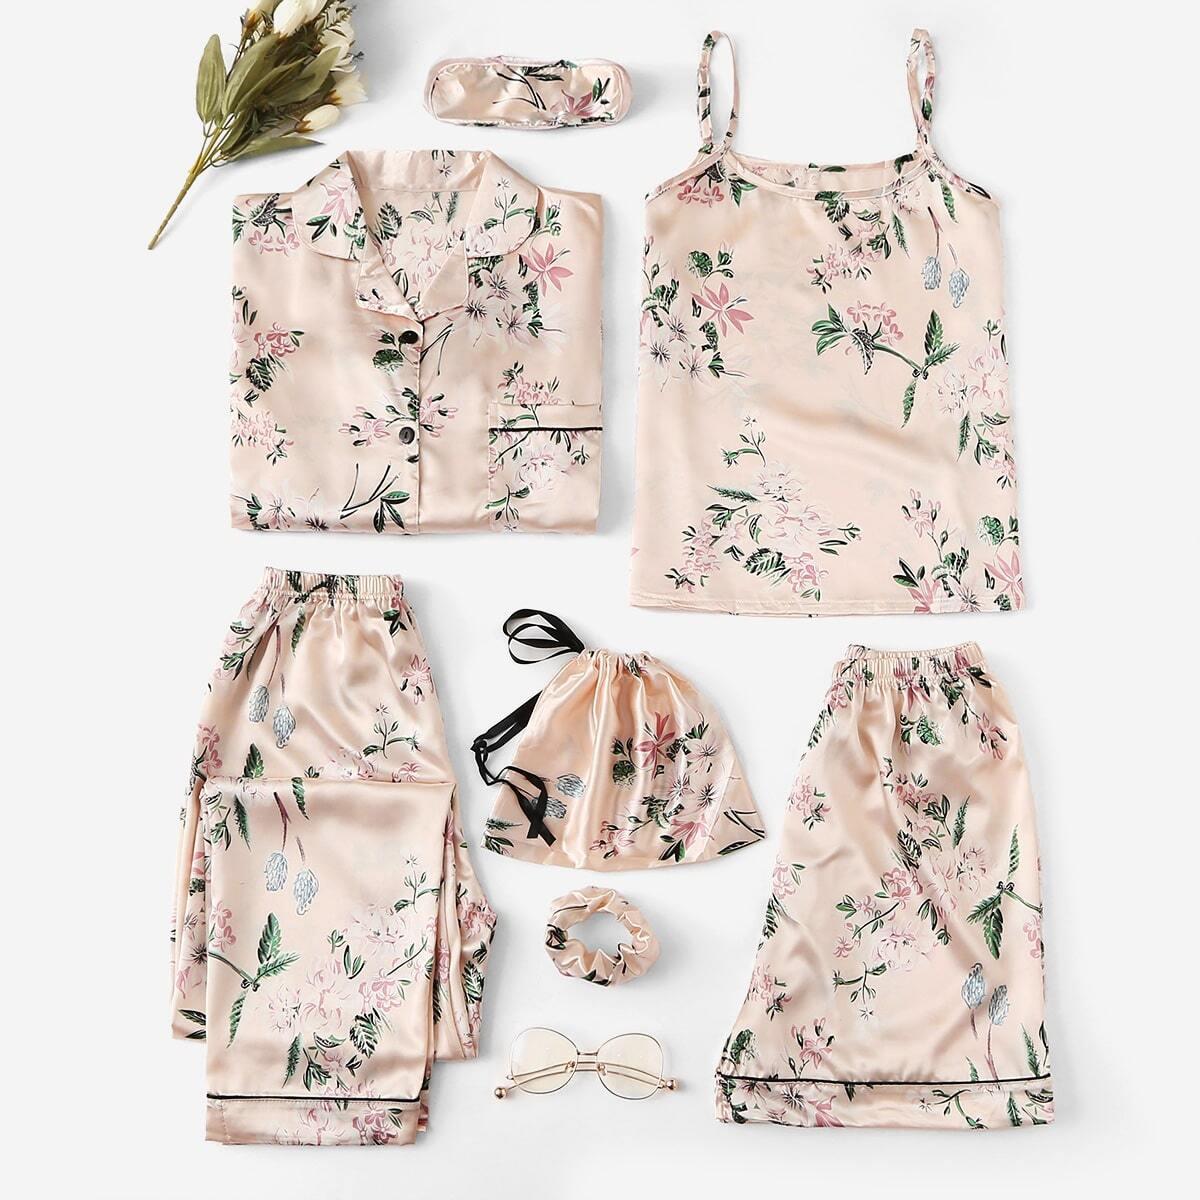 Abrikoos Elegant Bloemen Lounge kleding Knoop